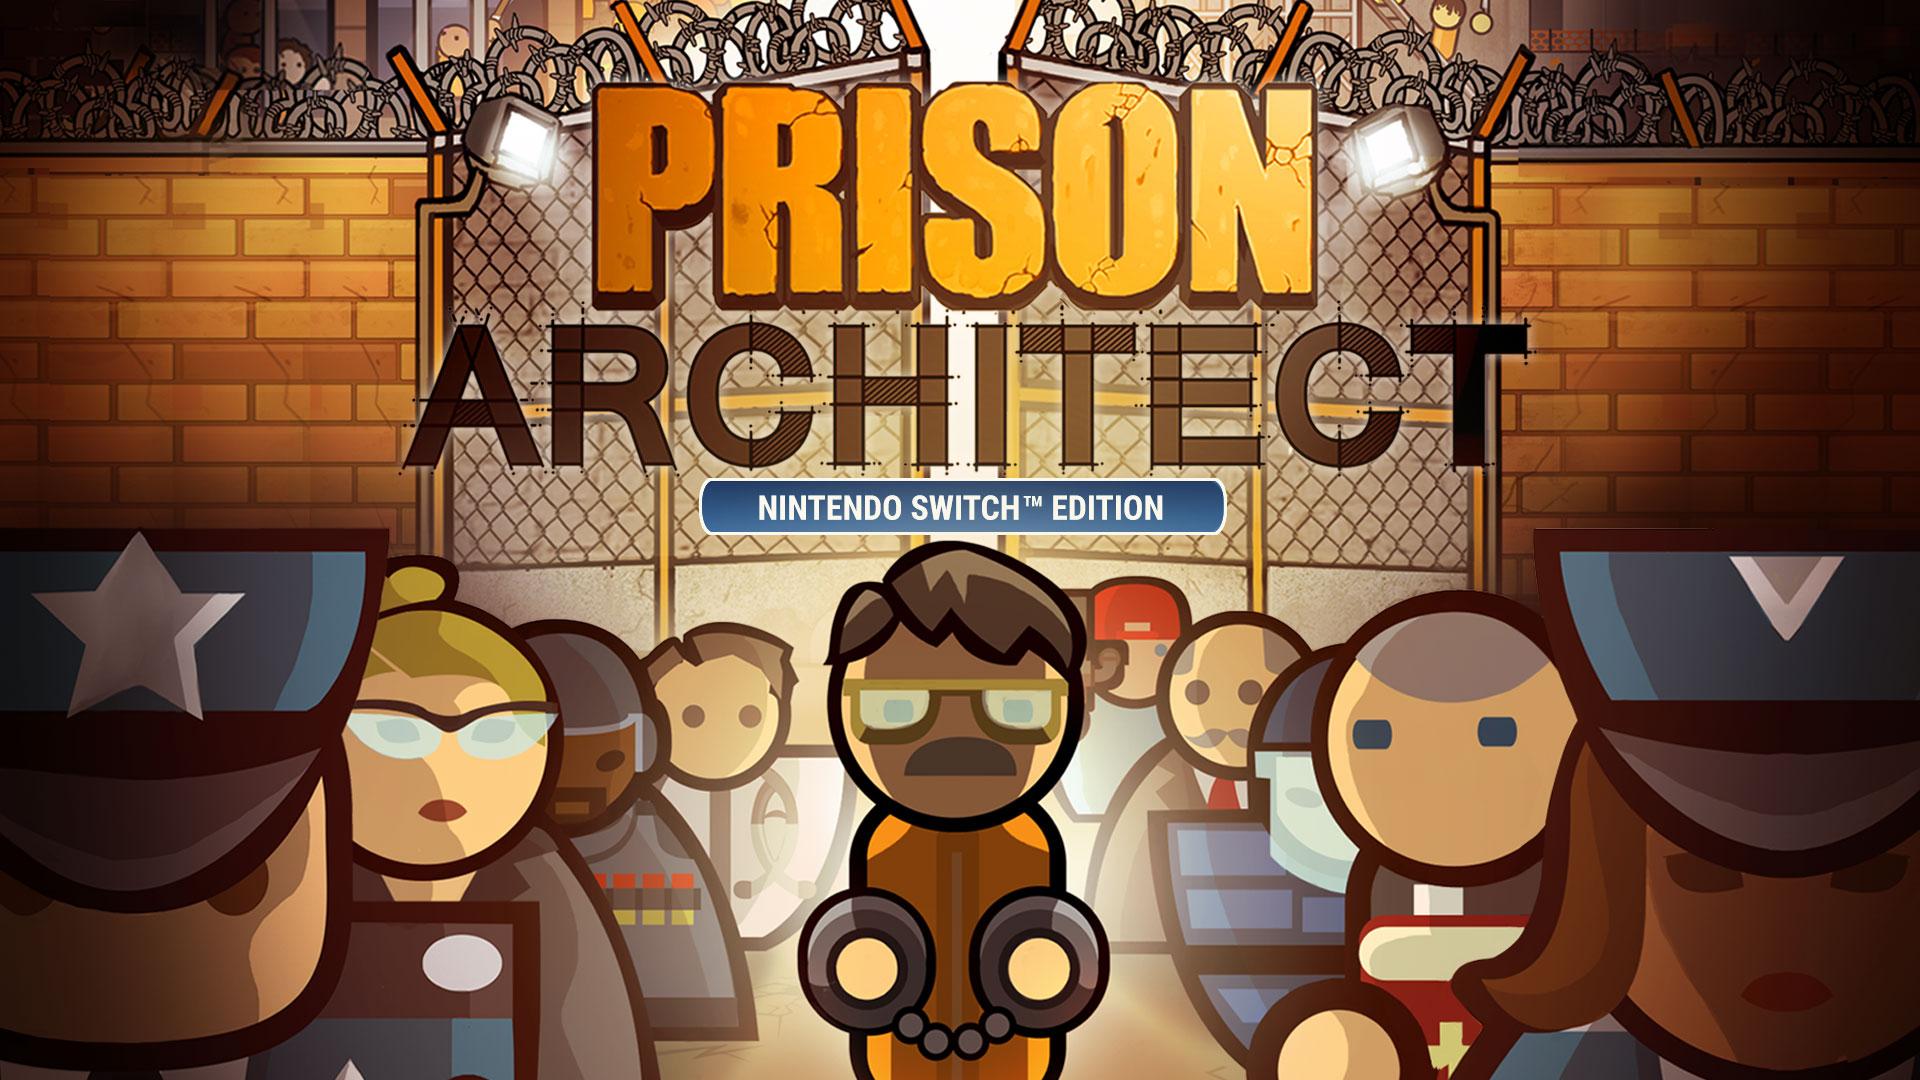 Prison Architect: Nintendo Switch Edition for Nintendo Switch - Nintendo Game Details $7.49